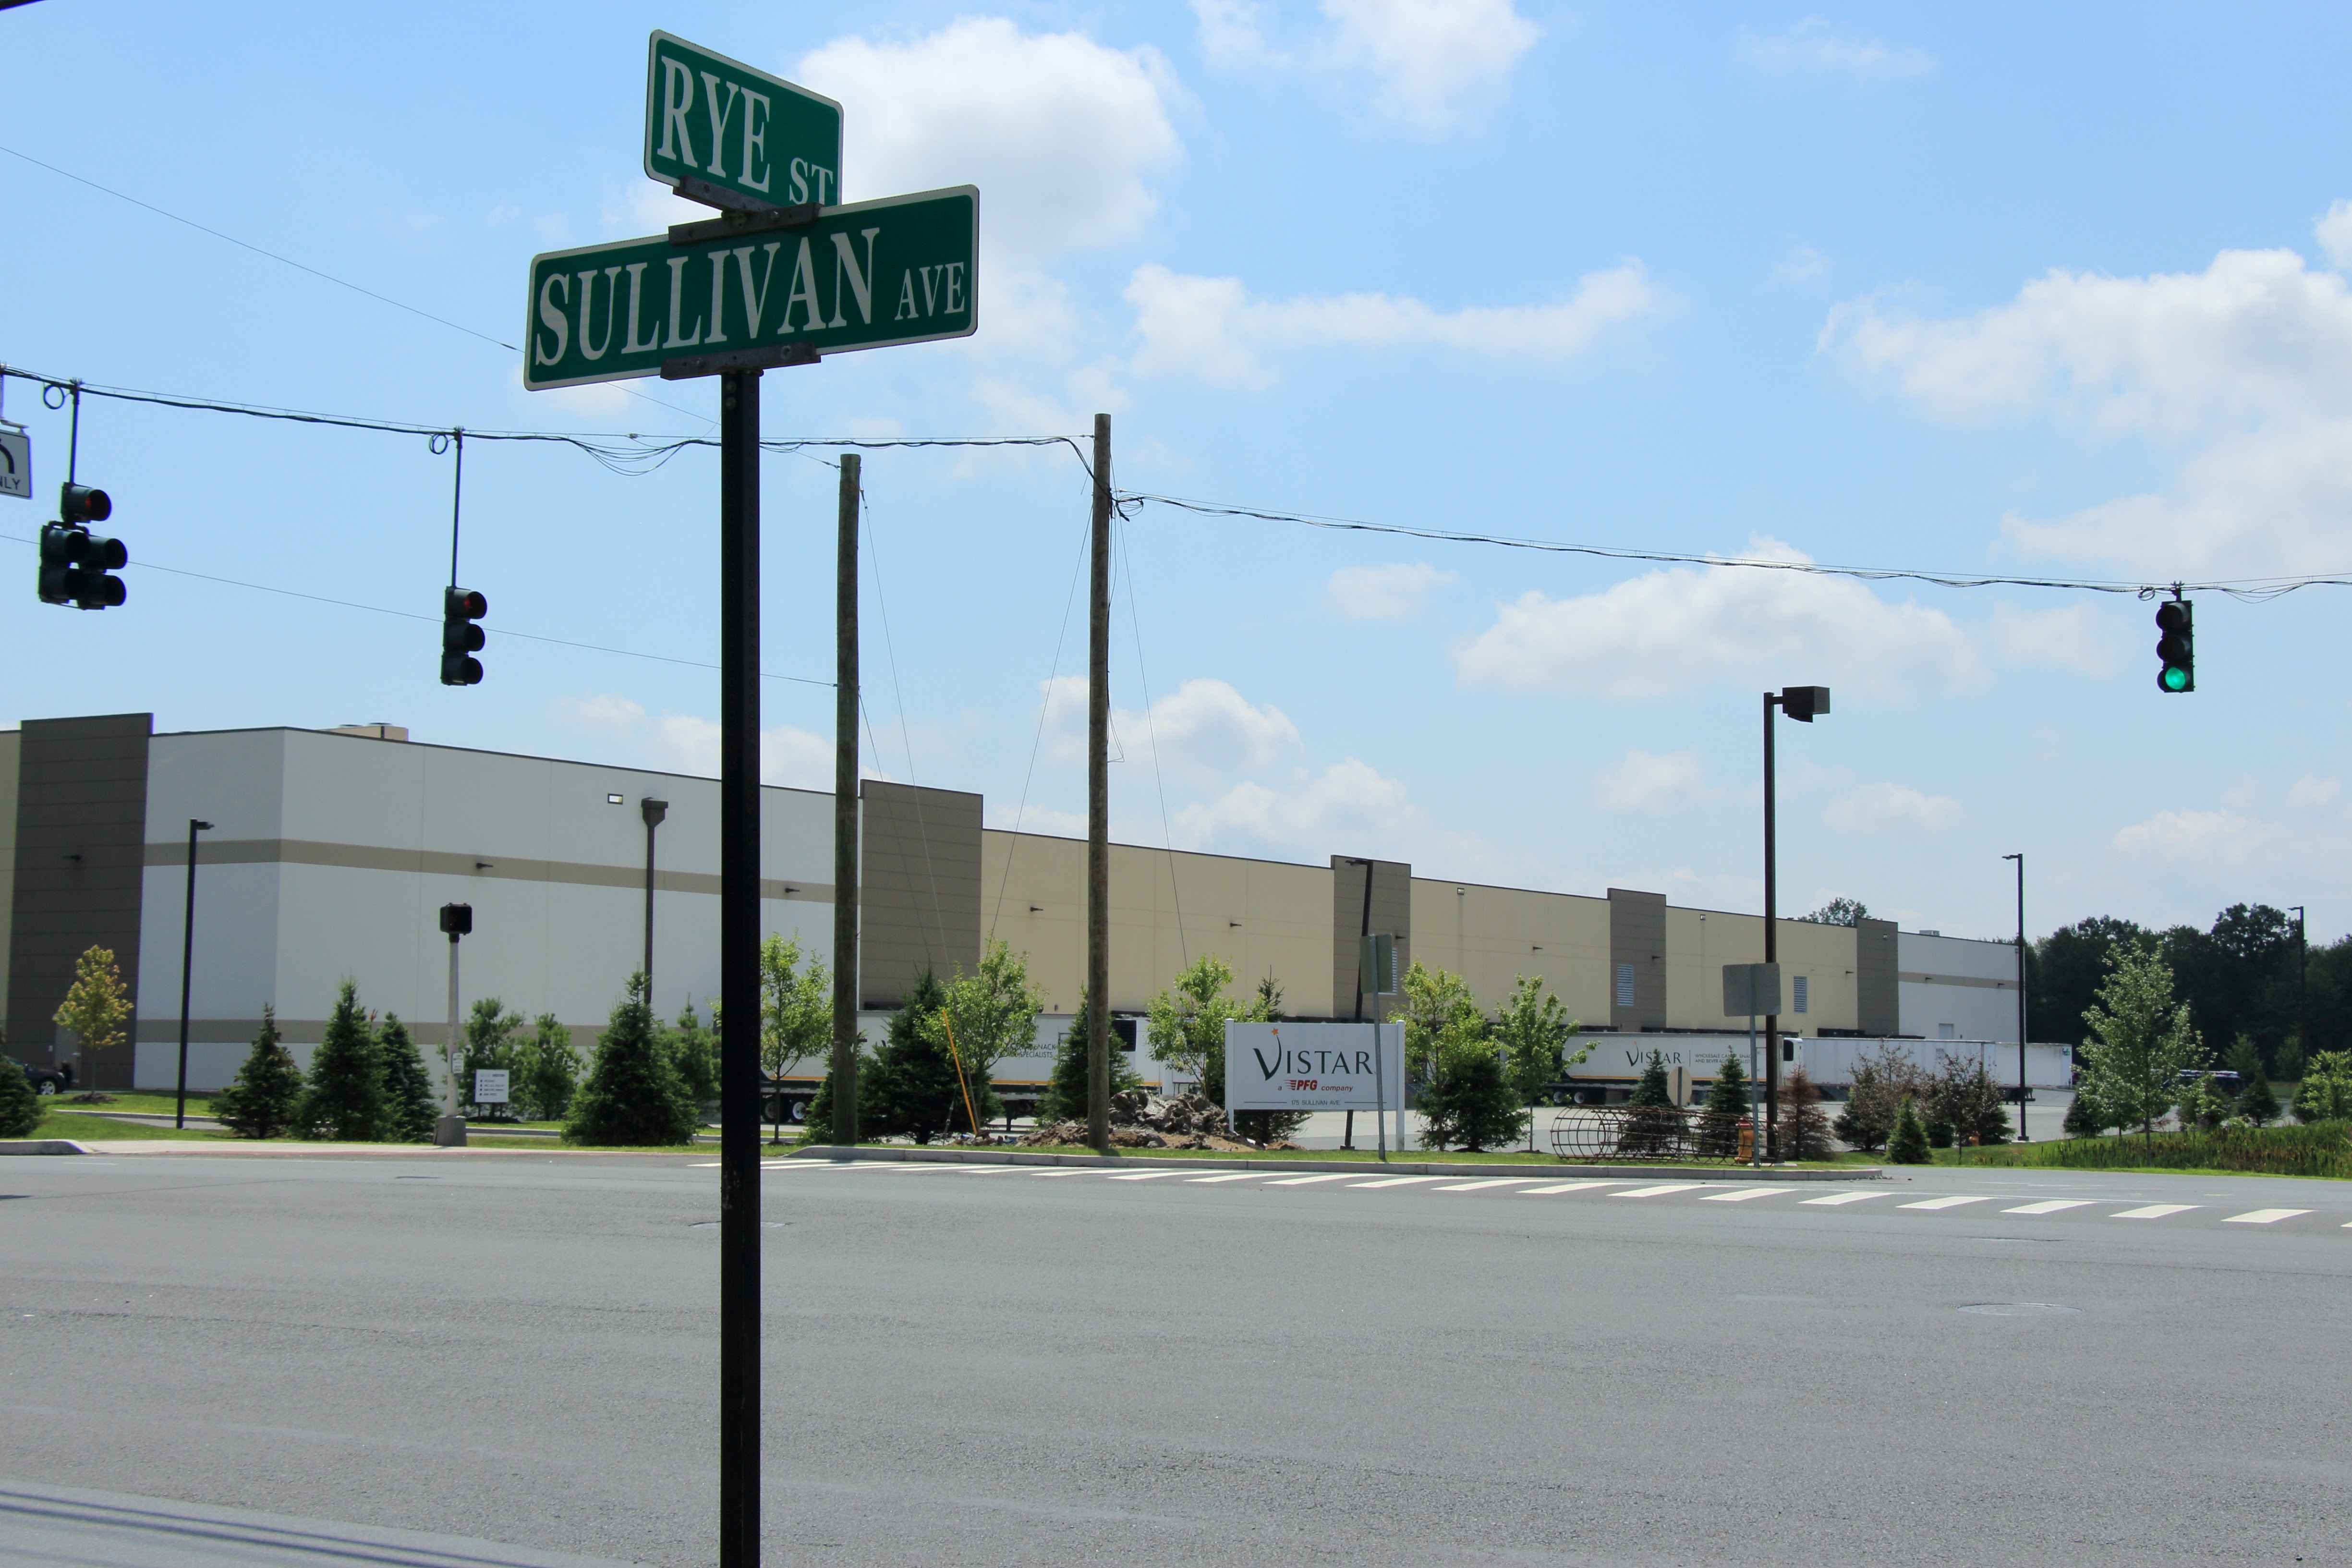 Rye & Sullivan